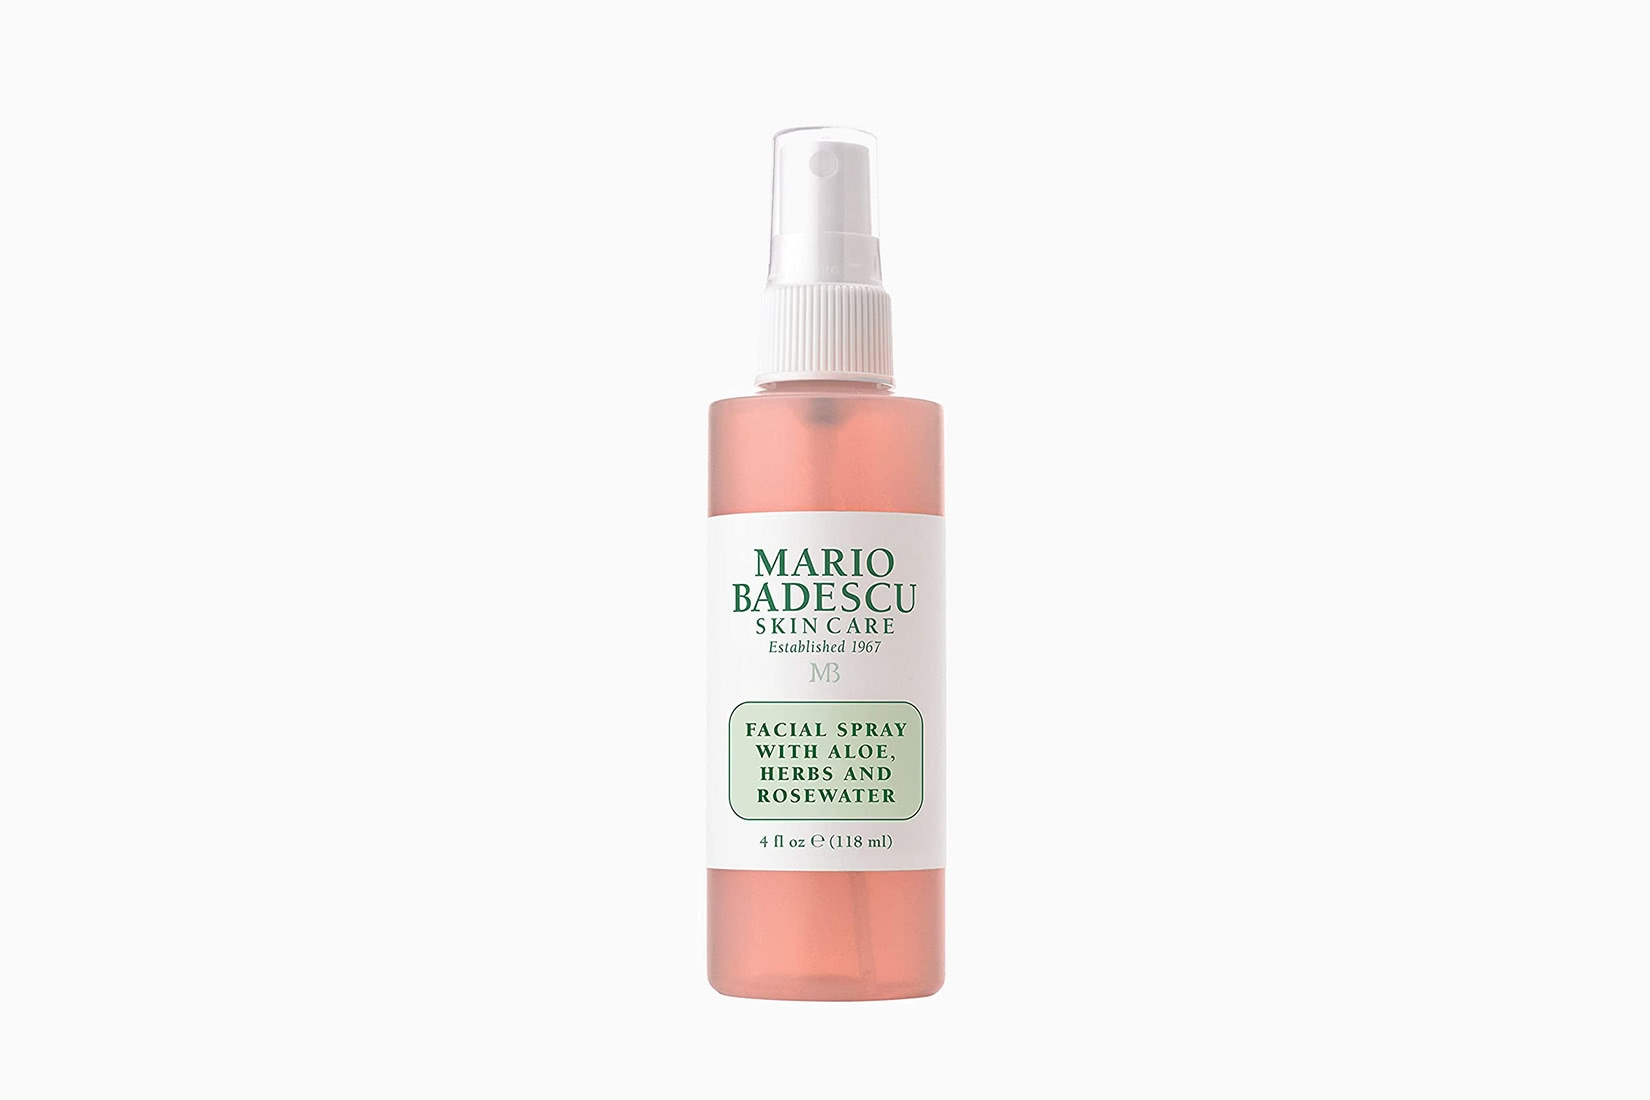 best natural organic beauty skincare mario badescu facial spray - Luxe Digital